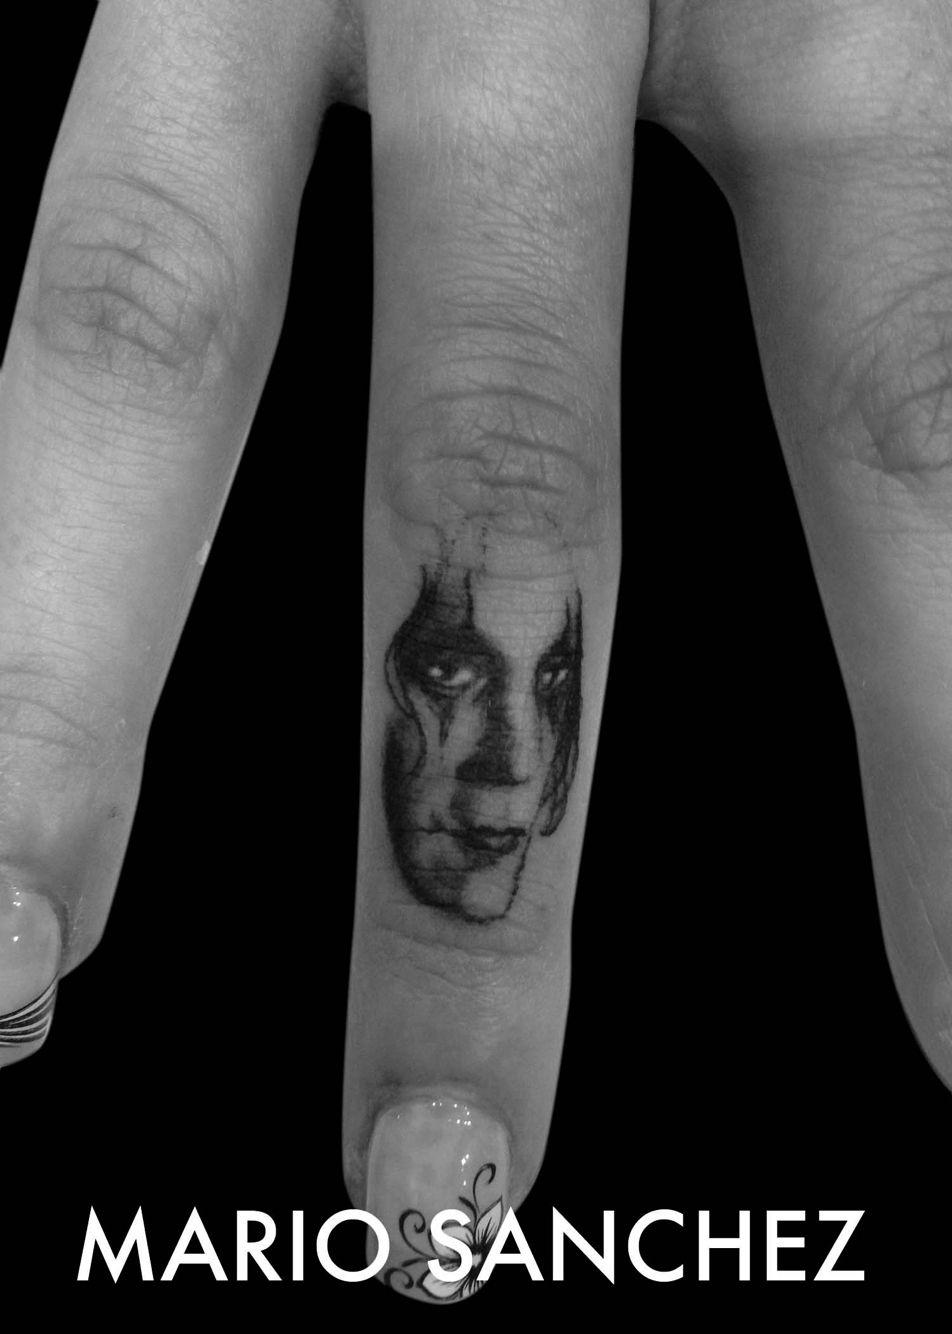 Miniature crow portrait on finger tattoo Finger tattoos